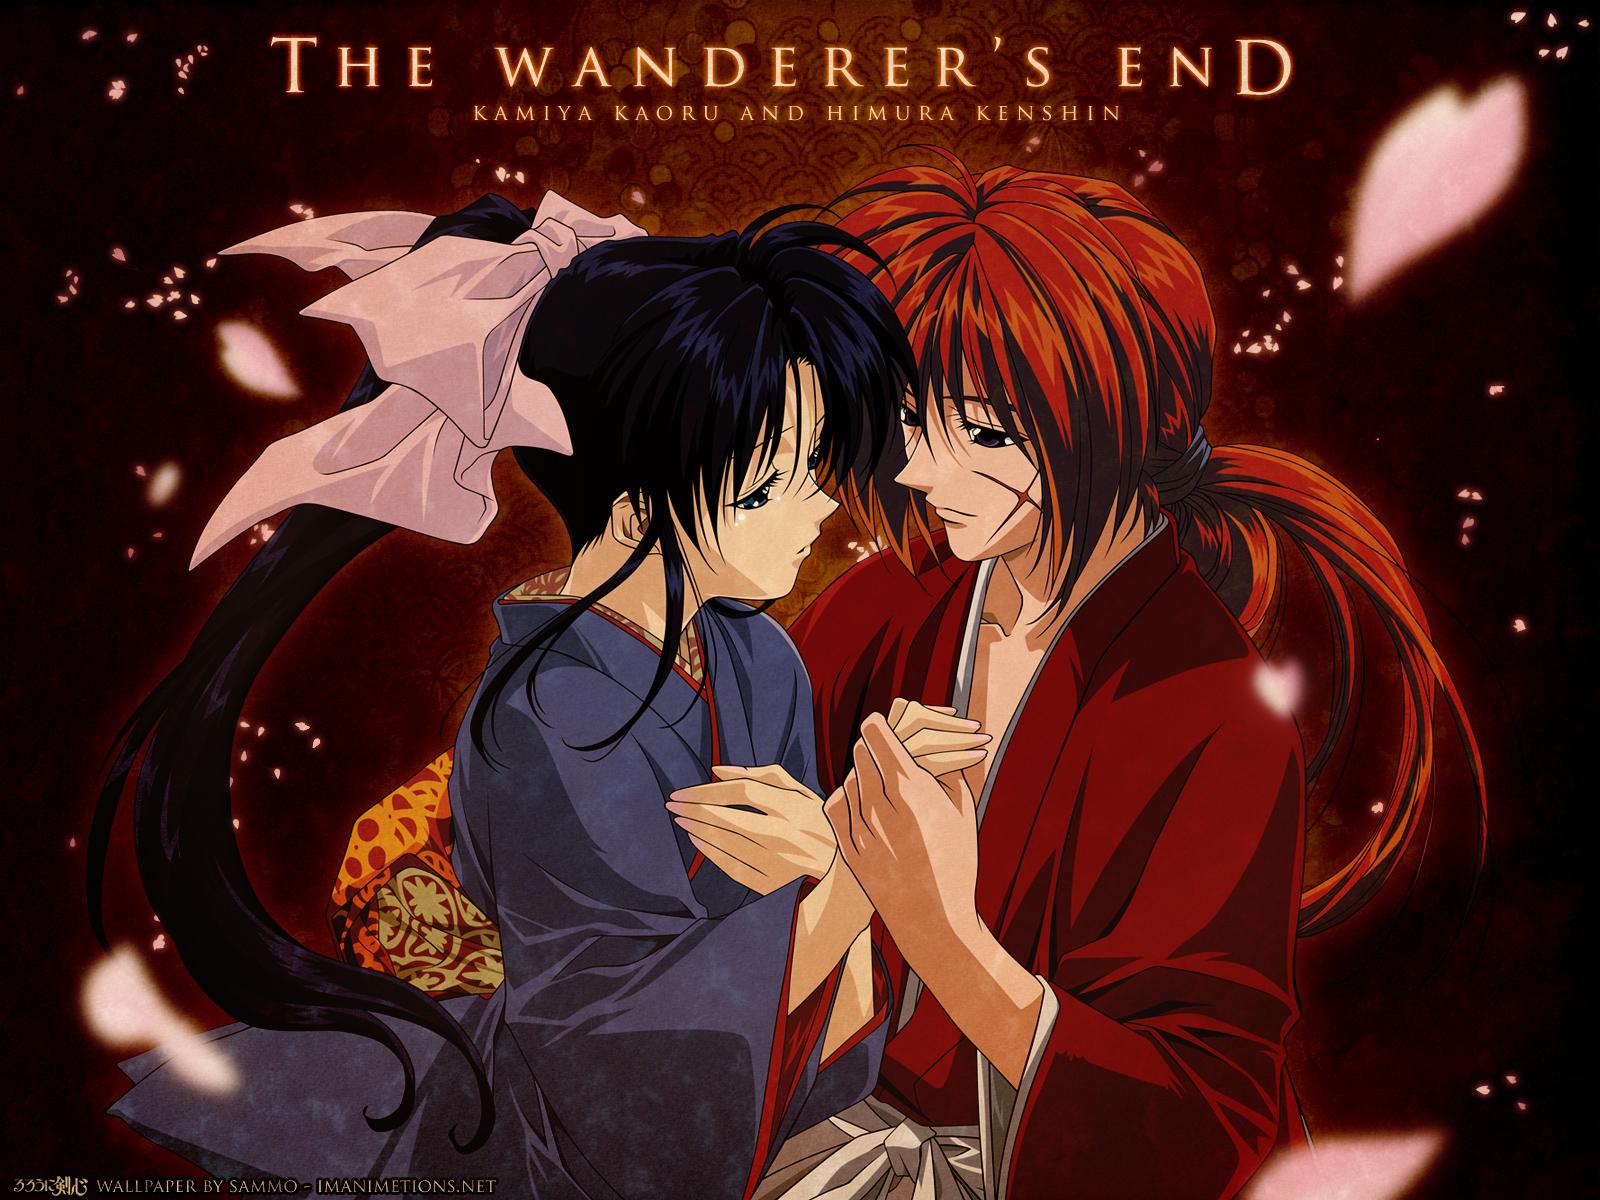 Rurouni Kenshin Wallpaper: The Wanderer's End - Kamiya ...